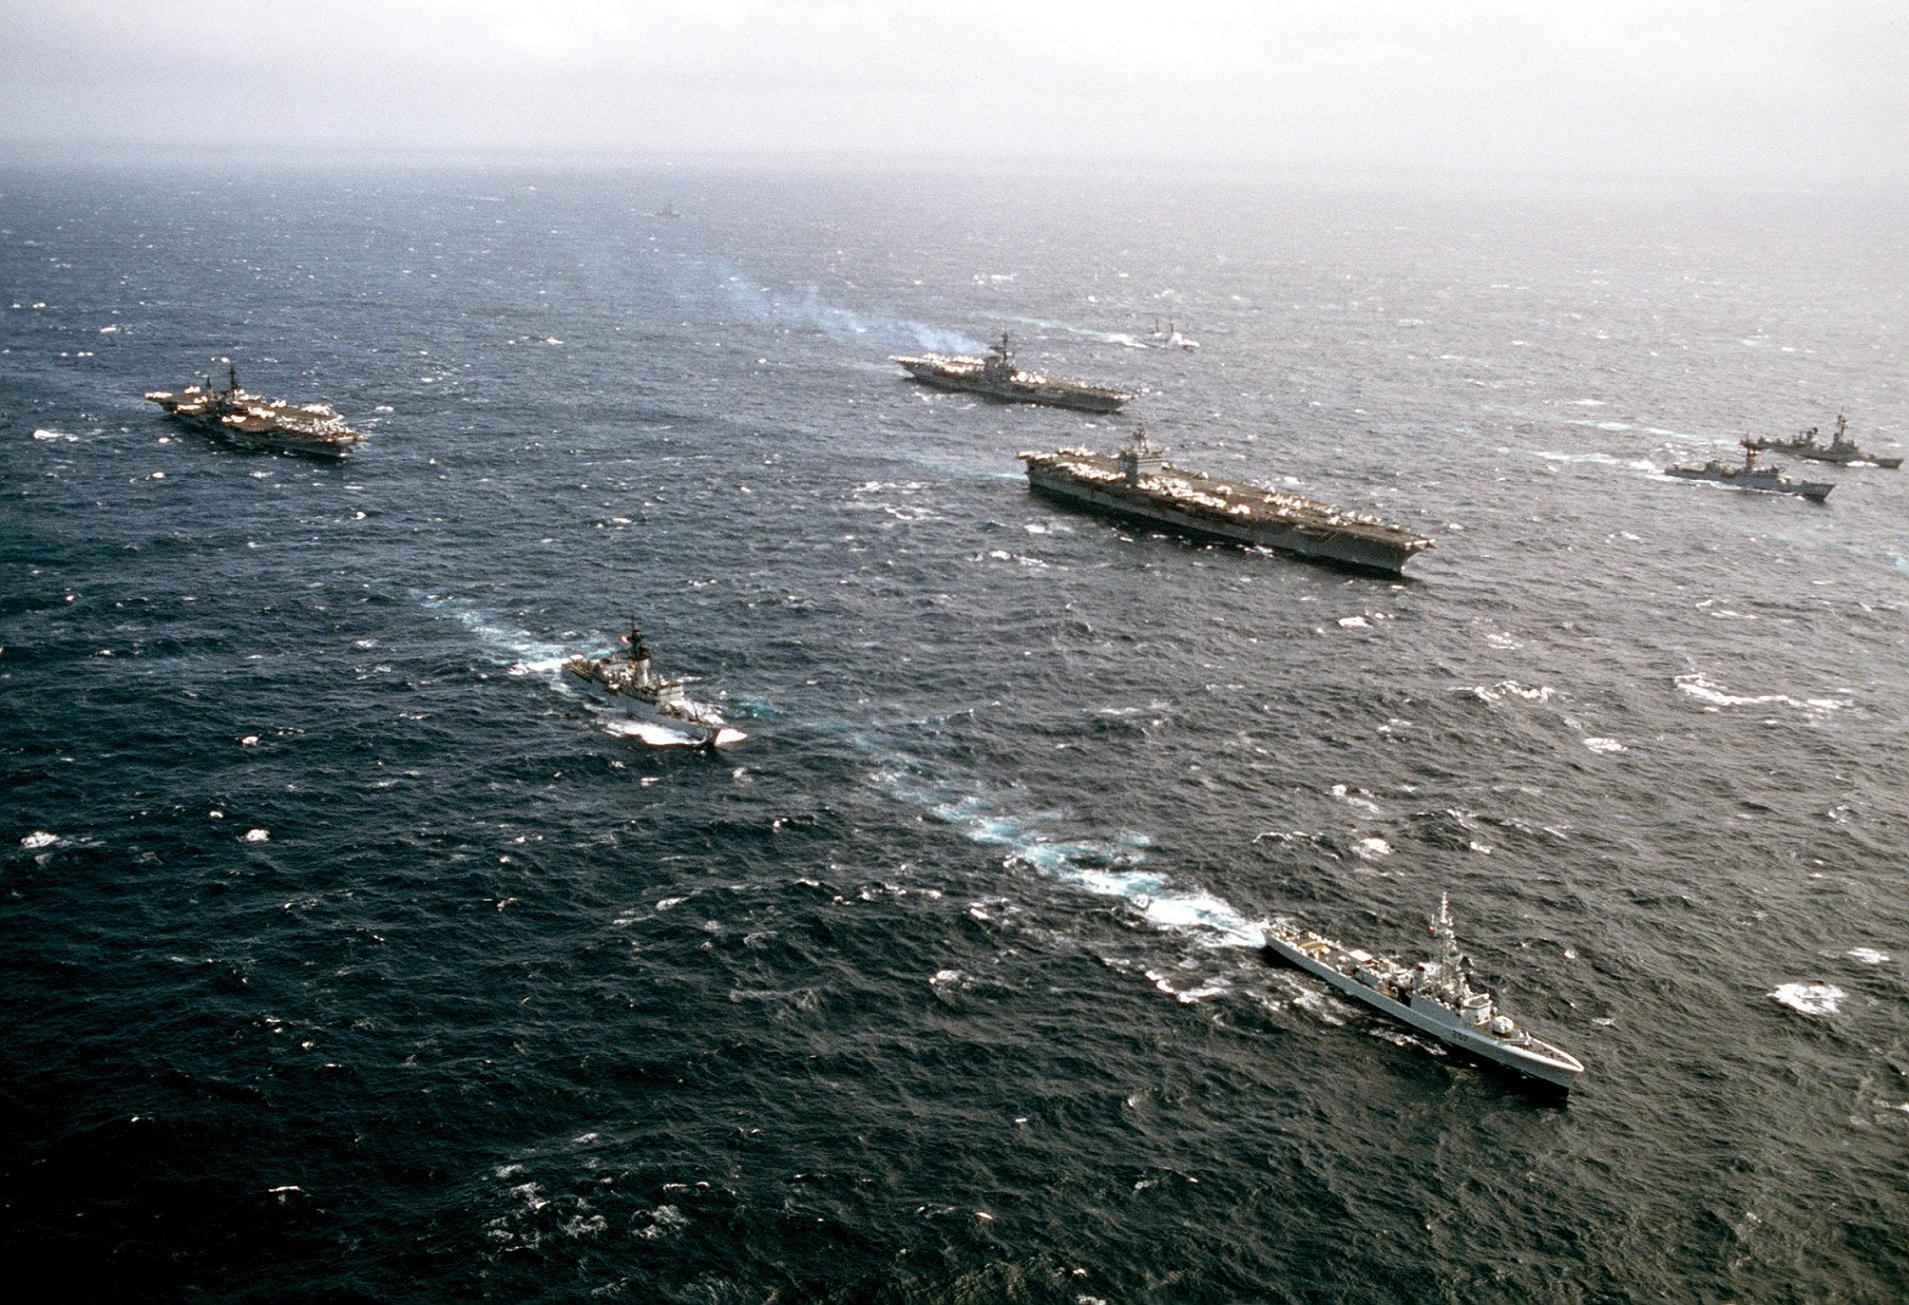 Cv Sea Uss Enterprise 43 41 65 Cv Uss Midway Cv Coral Uss